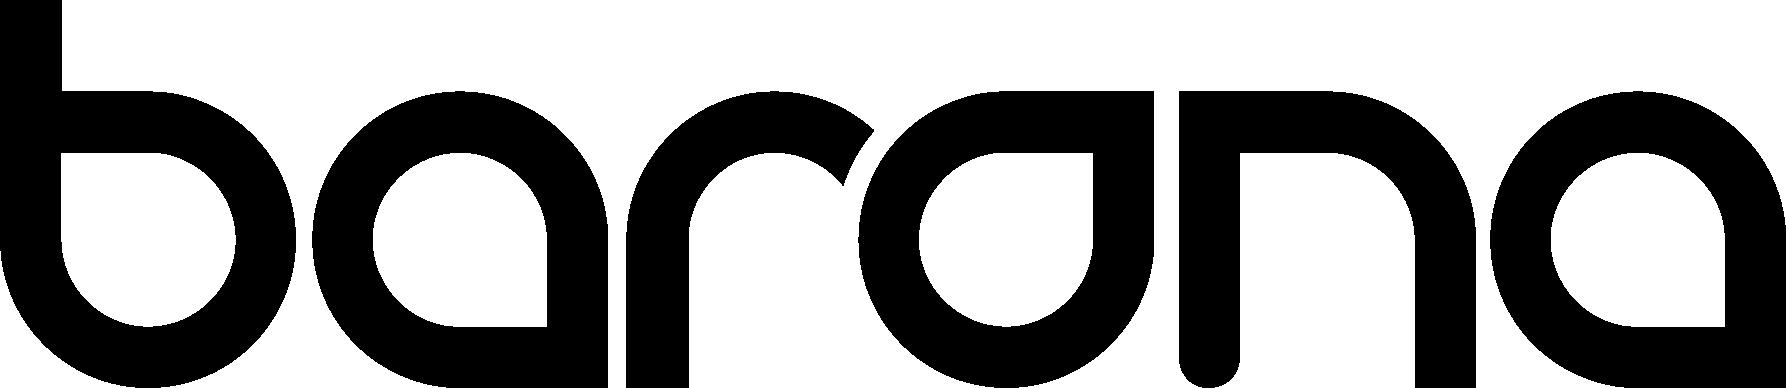 Barona Logo RGB black